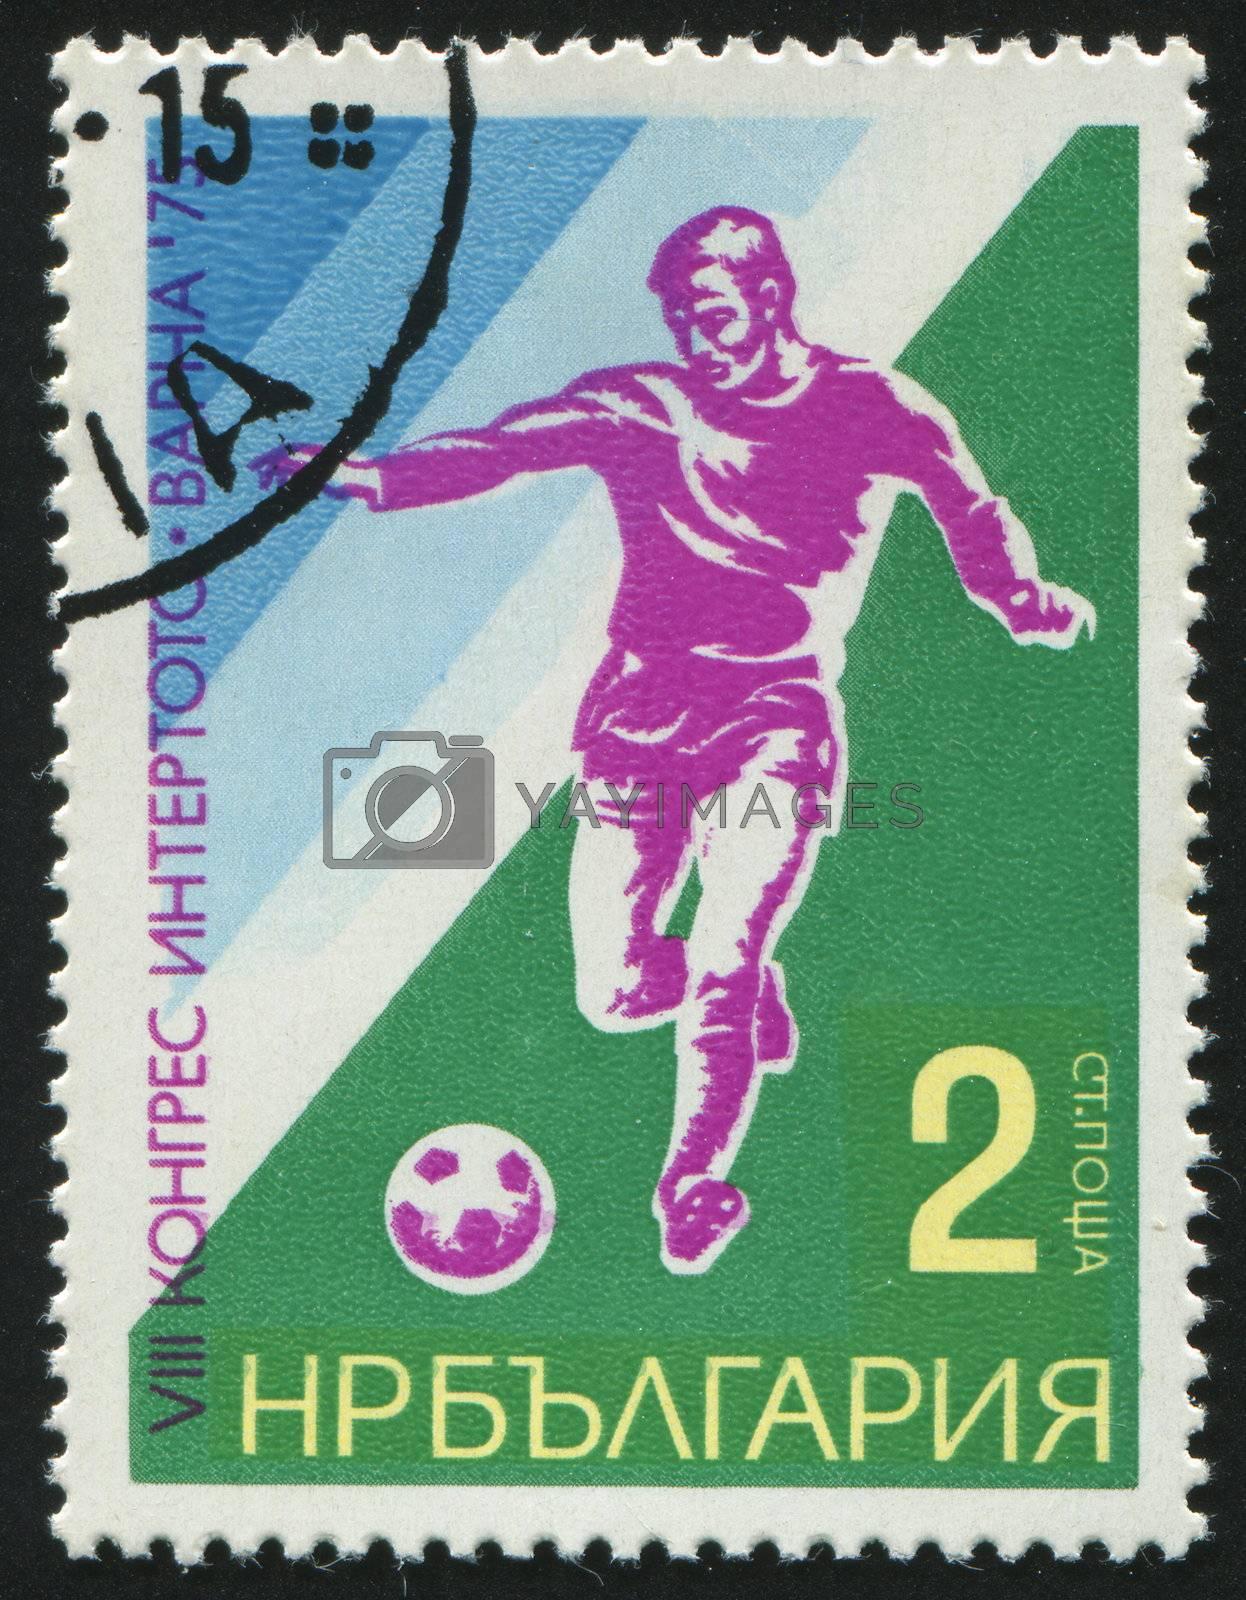 BULGARIA - CIRCA 1975: stamp printed by Bulgaria, shows football, circa 1975.